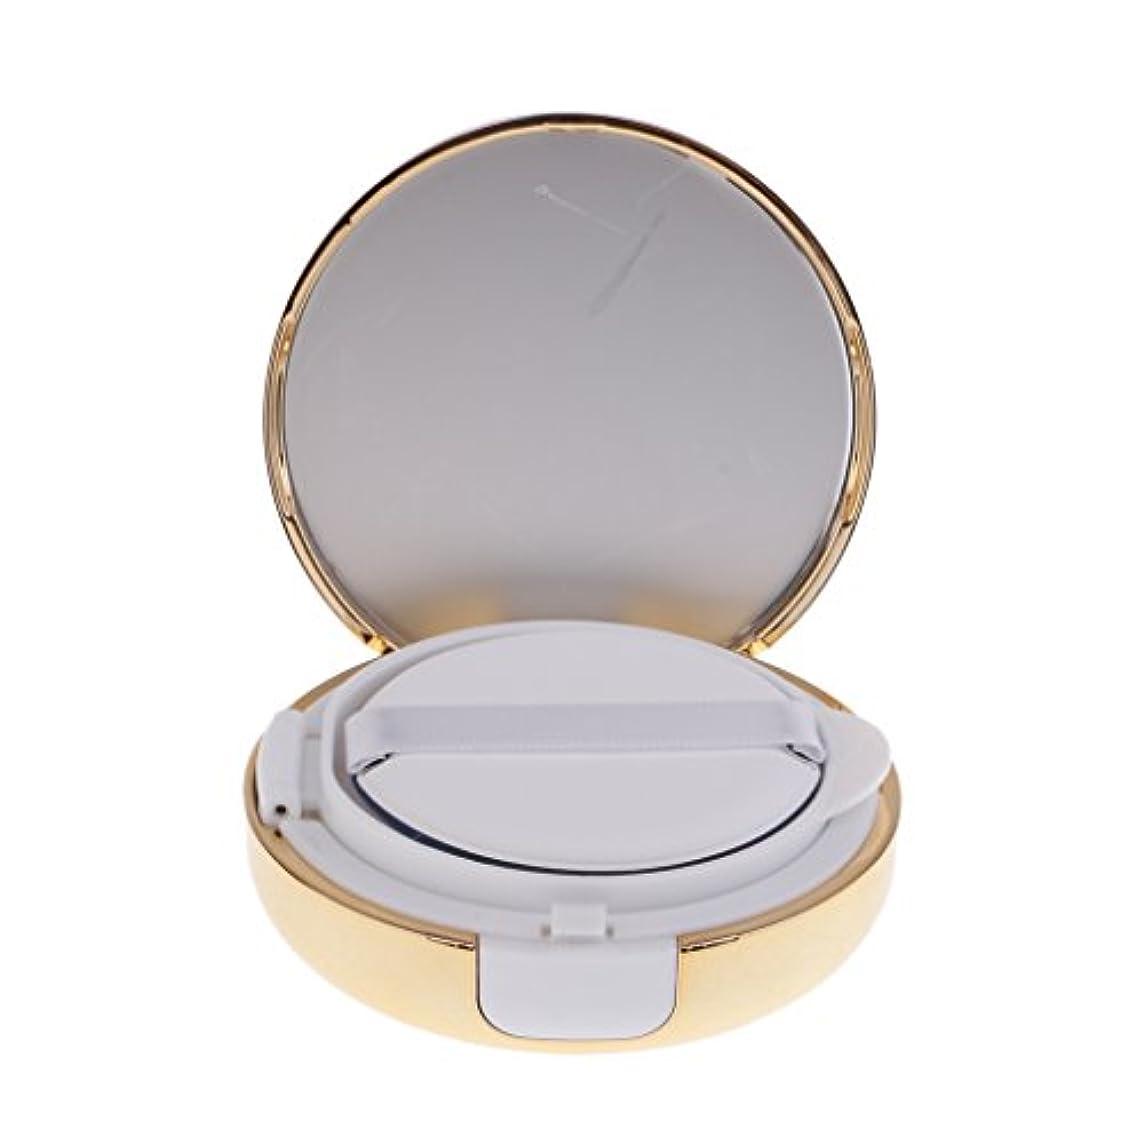 Kesoto メイクアップ 空パウダーコンテナ ファンデーションケース エアクッション パフ BBクリーム 詰替え 化粧品 DIY プラスチック製 2色選べる - ゴールド